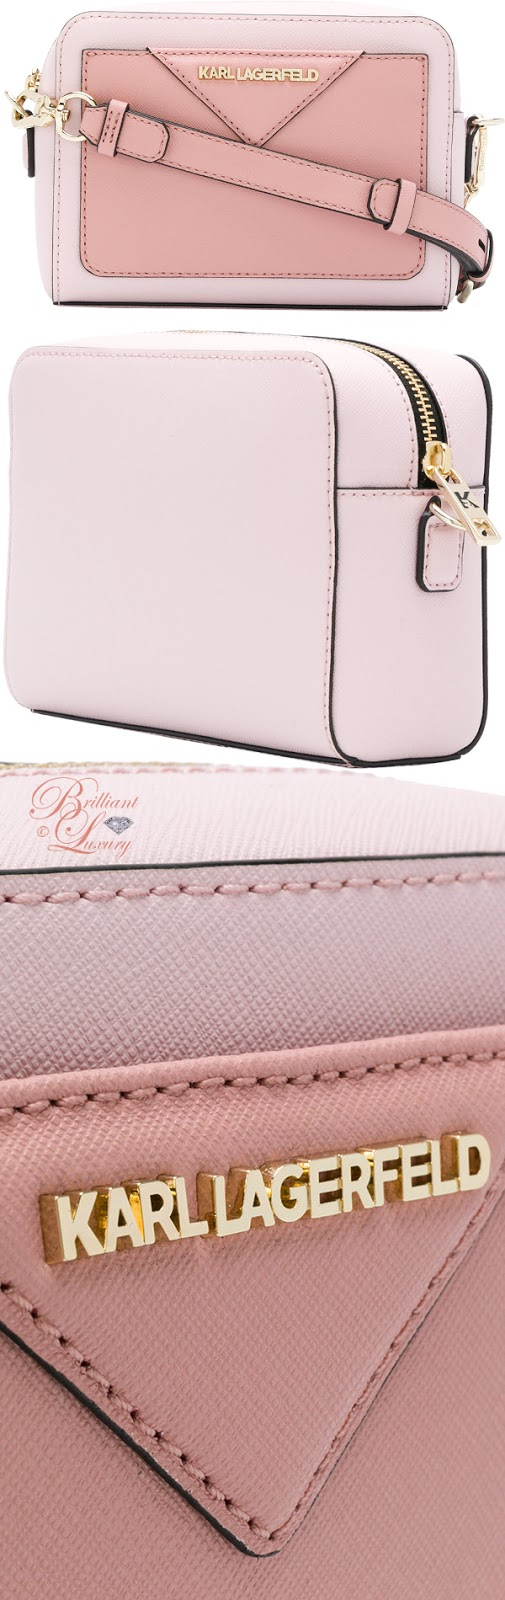 Brilliant Luxury ♦ Karl Lagerfeld Klassik camera bag